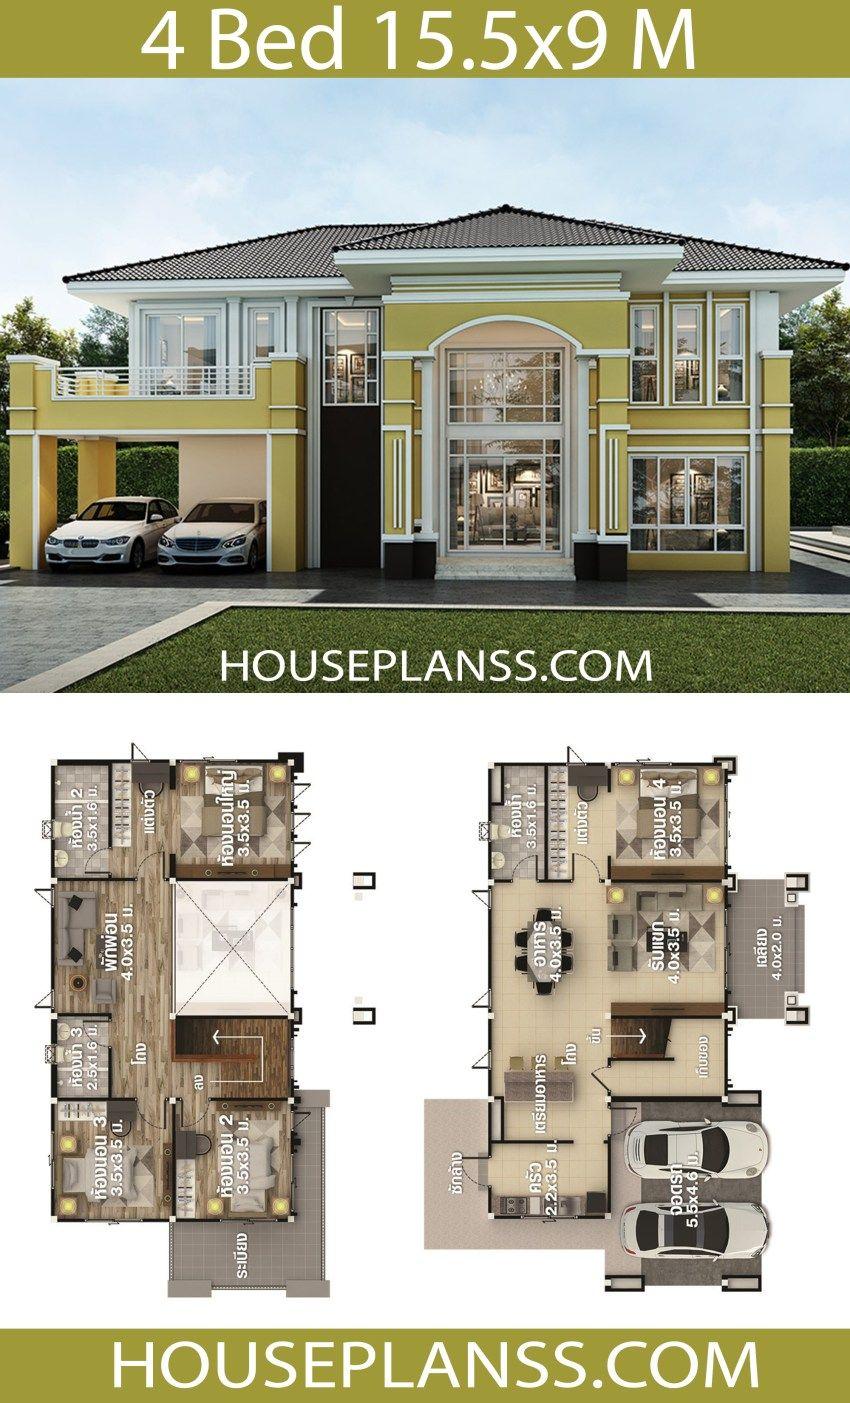 House Plans Idea 15 5x9 With 4 Bedrooms House Plans 3d Brick House Designs House Construction Plan Model House Plan